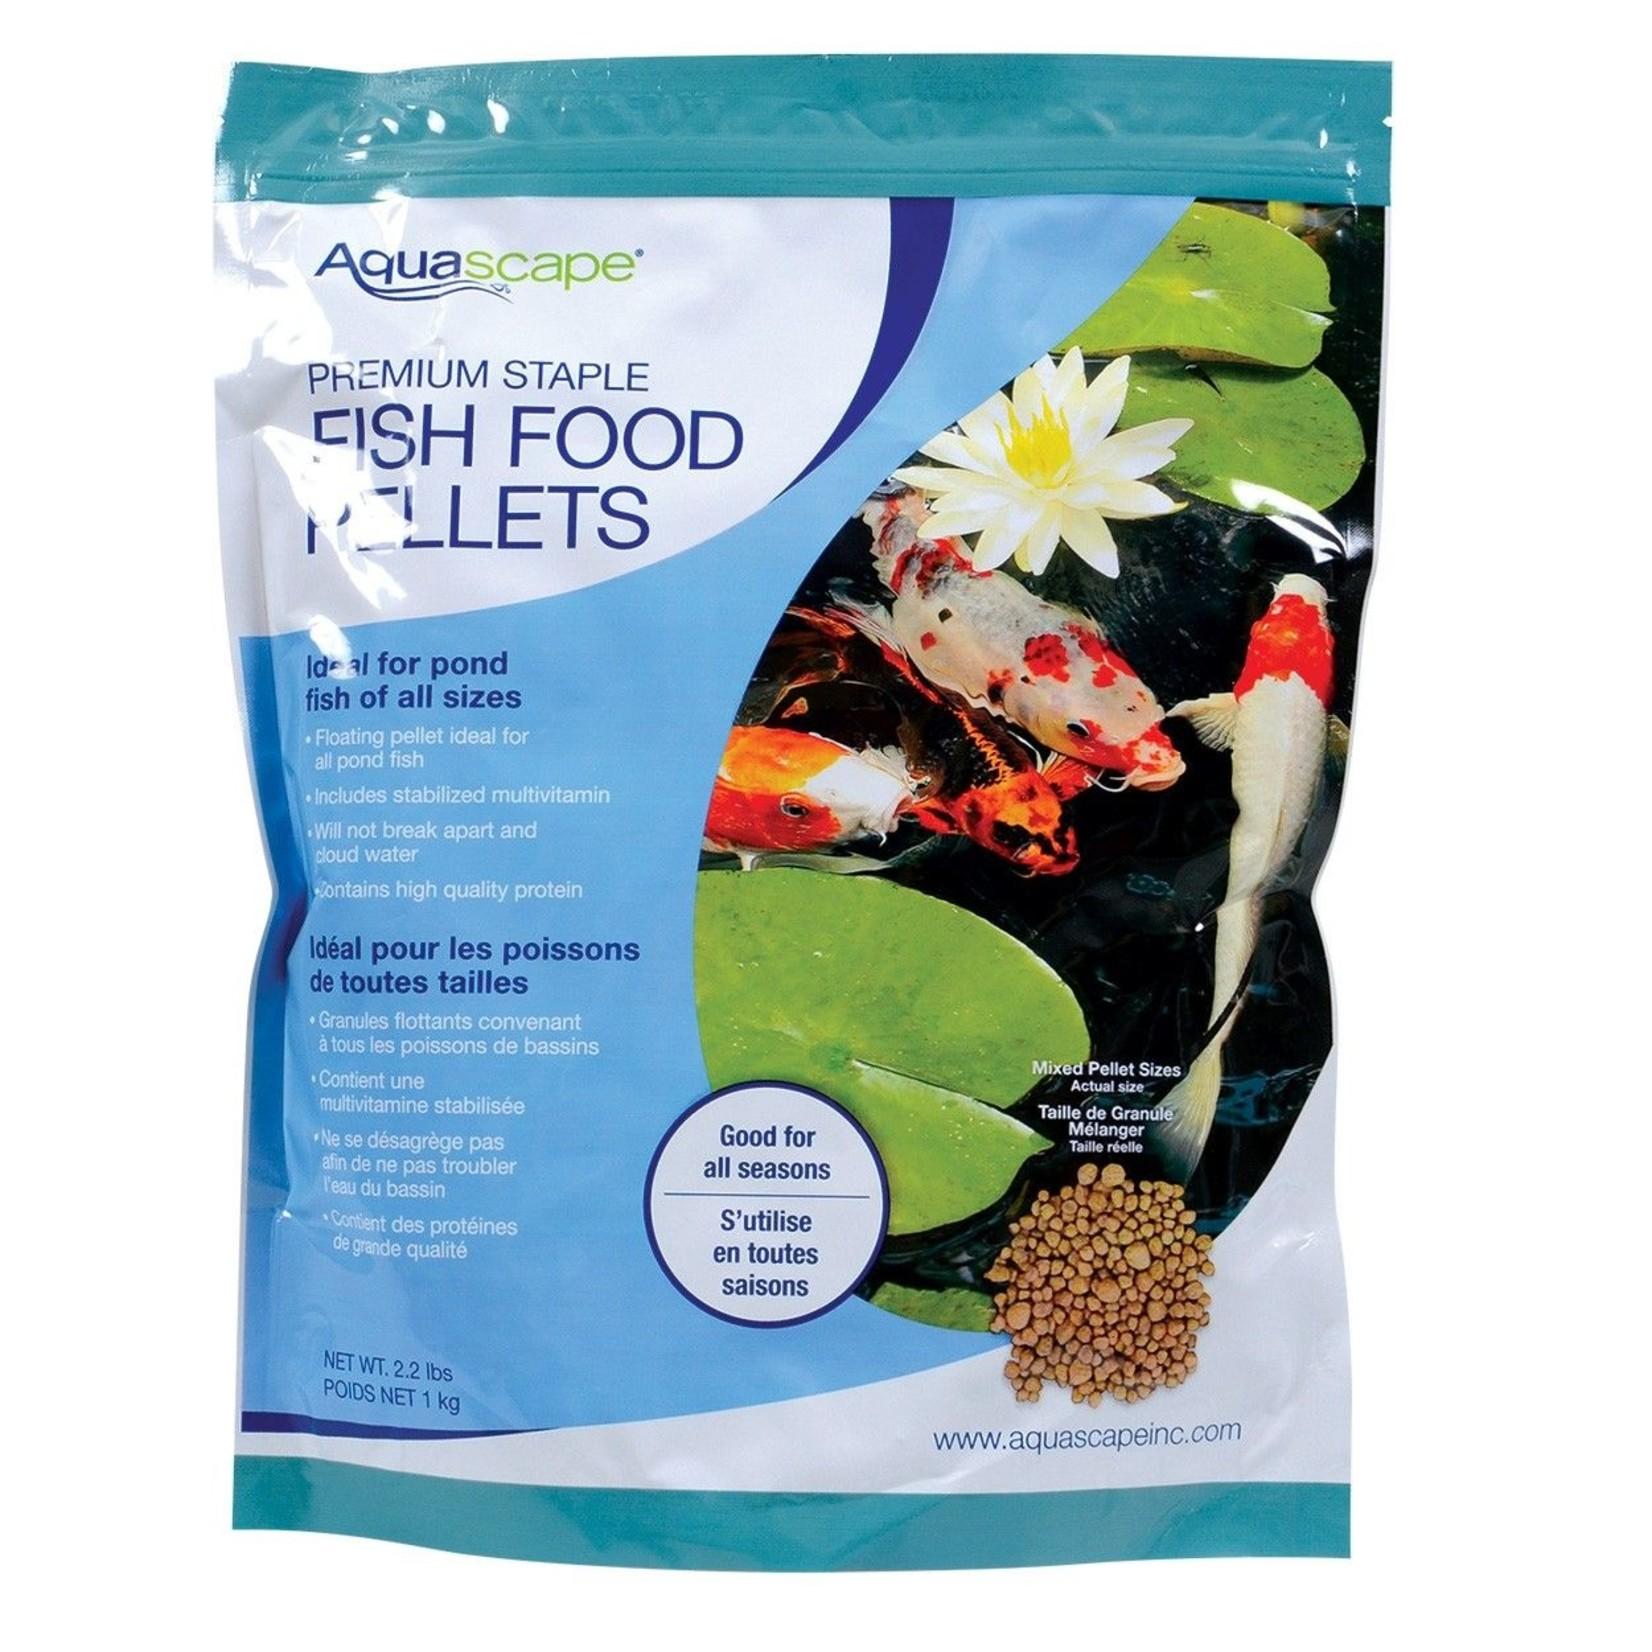 Aquascape Premium Staple Fish Food Pellets 1kg